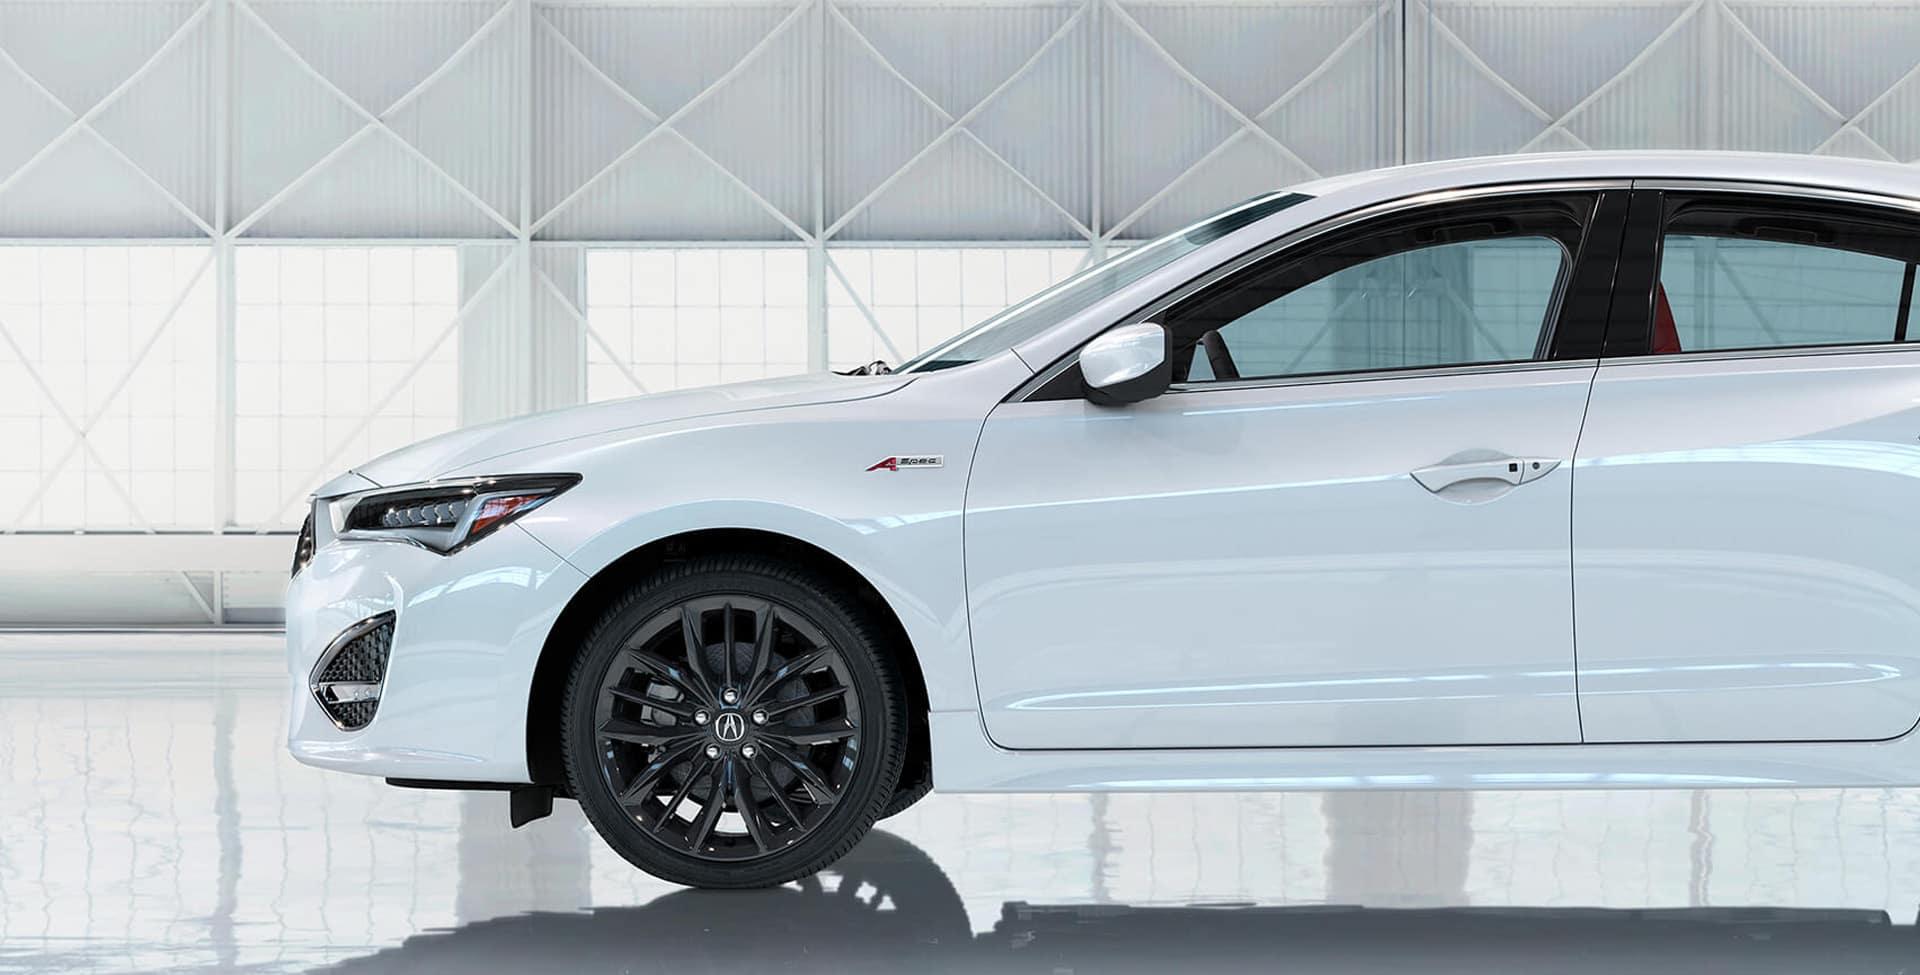 Acura ILX A-spec badging